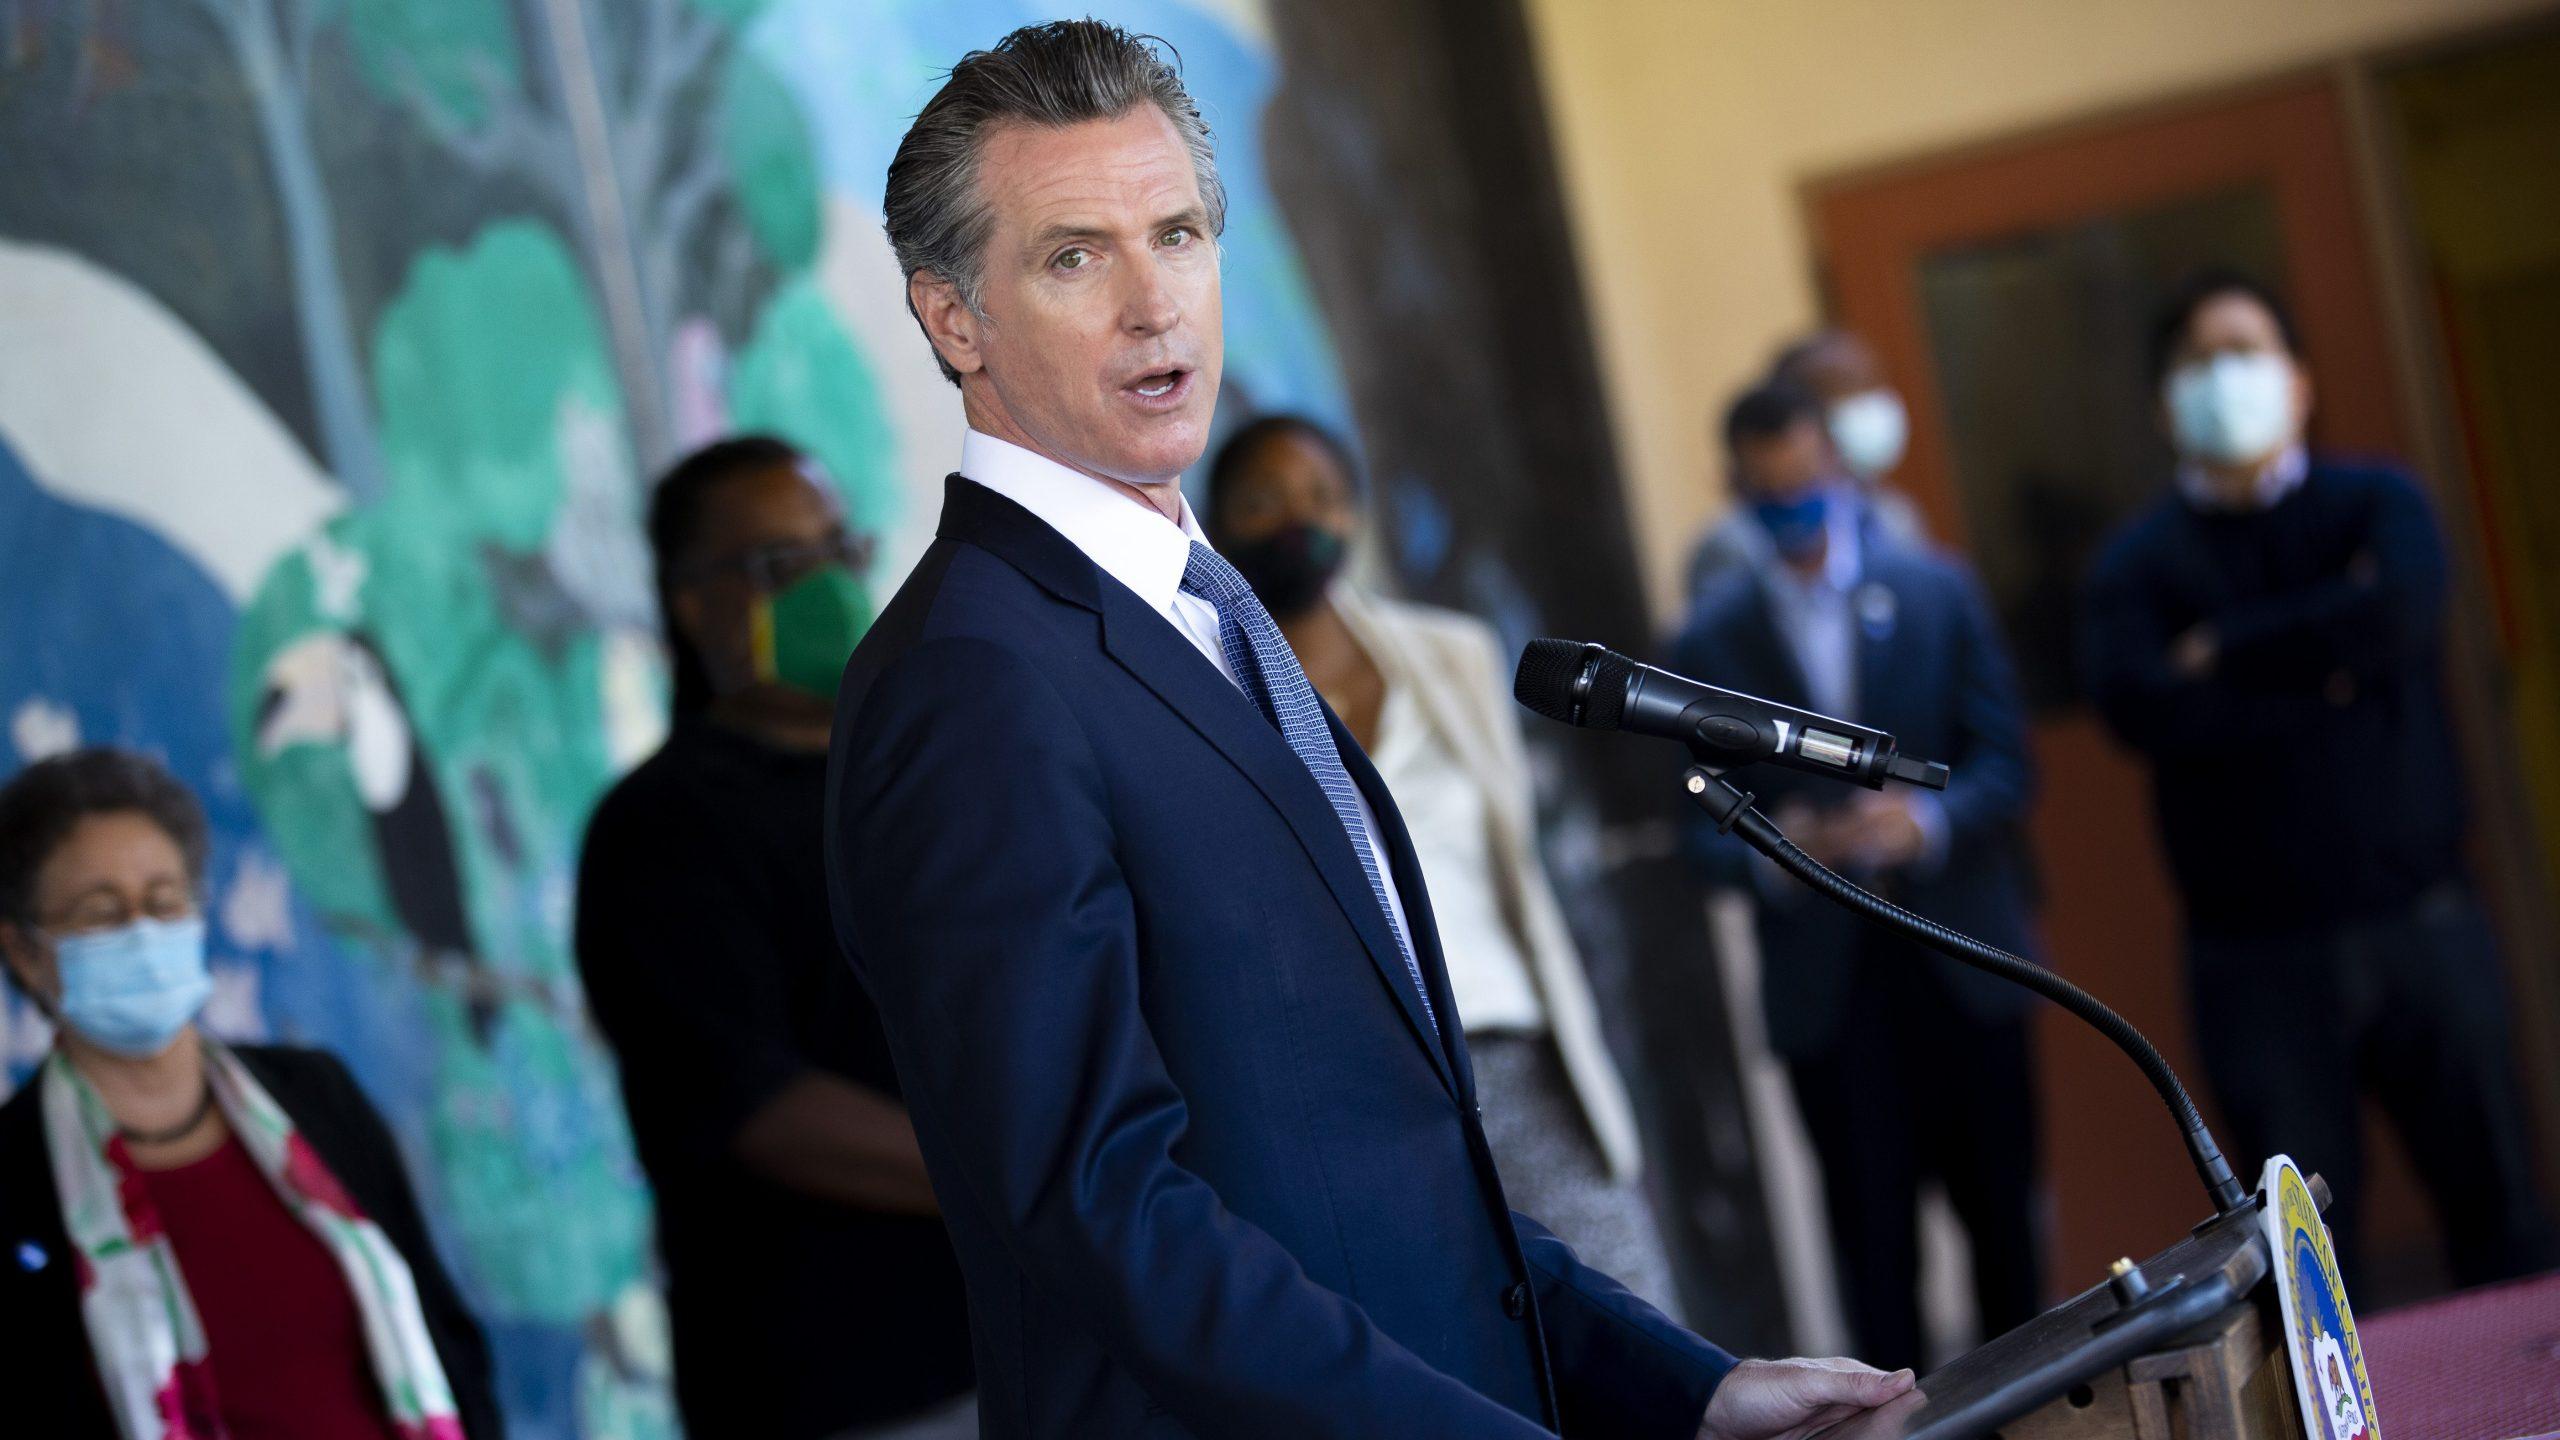 California Gov. Gavin Newsom speaks with reporters at Carl B. Munck Elementary School in Oakland on Aug. 11, 2021. (Santiago Mejia / San Francisco Chronicle via Associated Press)